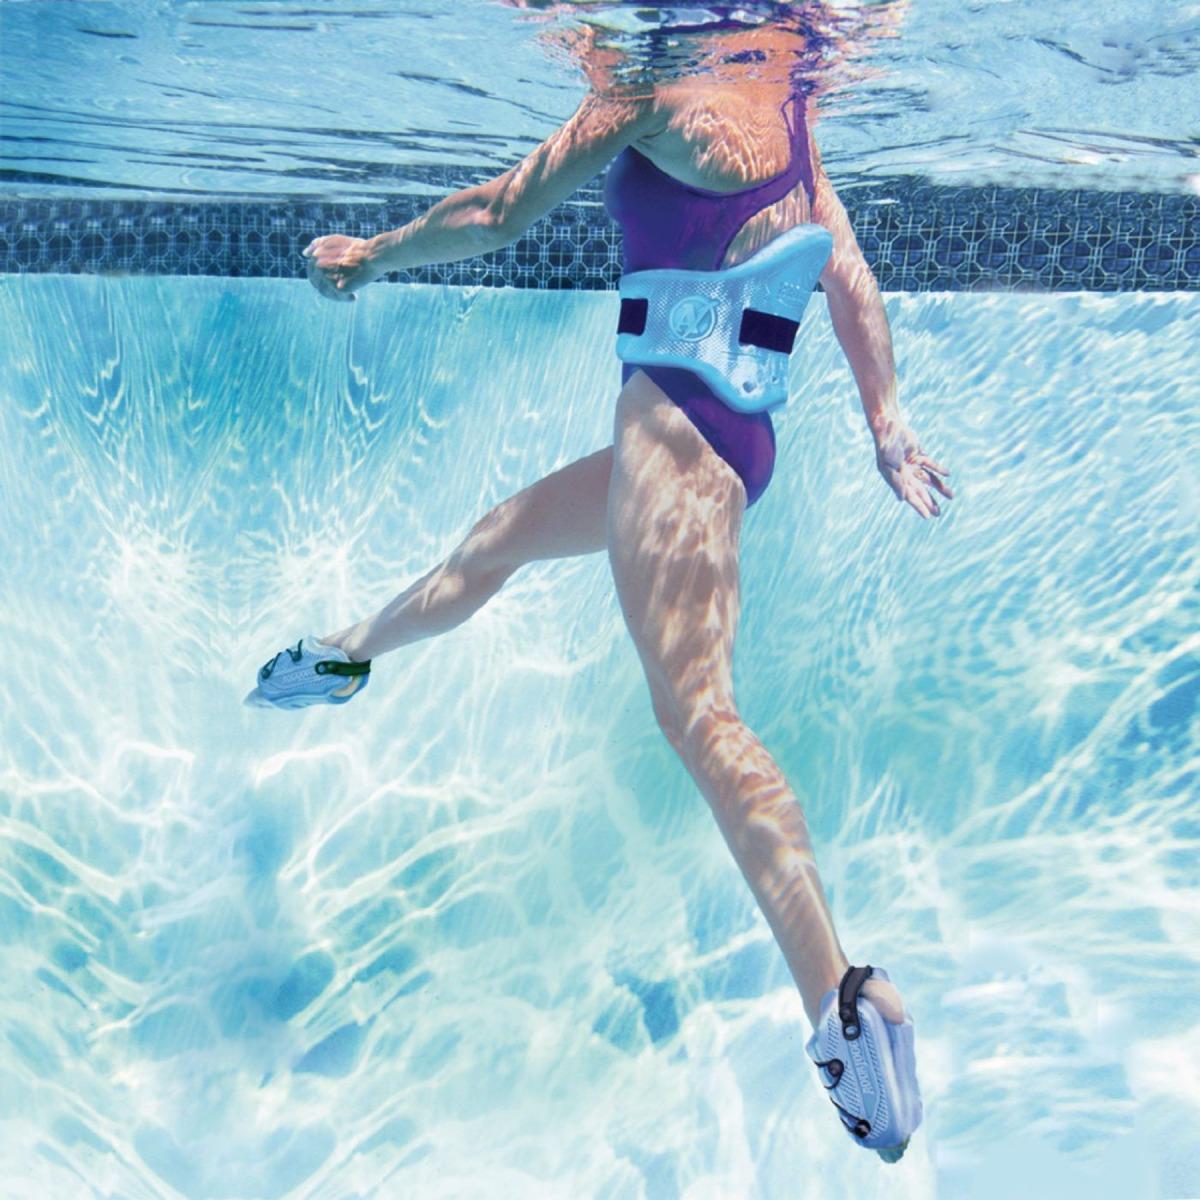 The Aquarunner